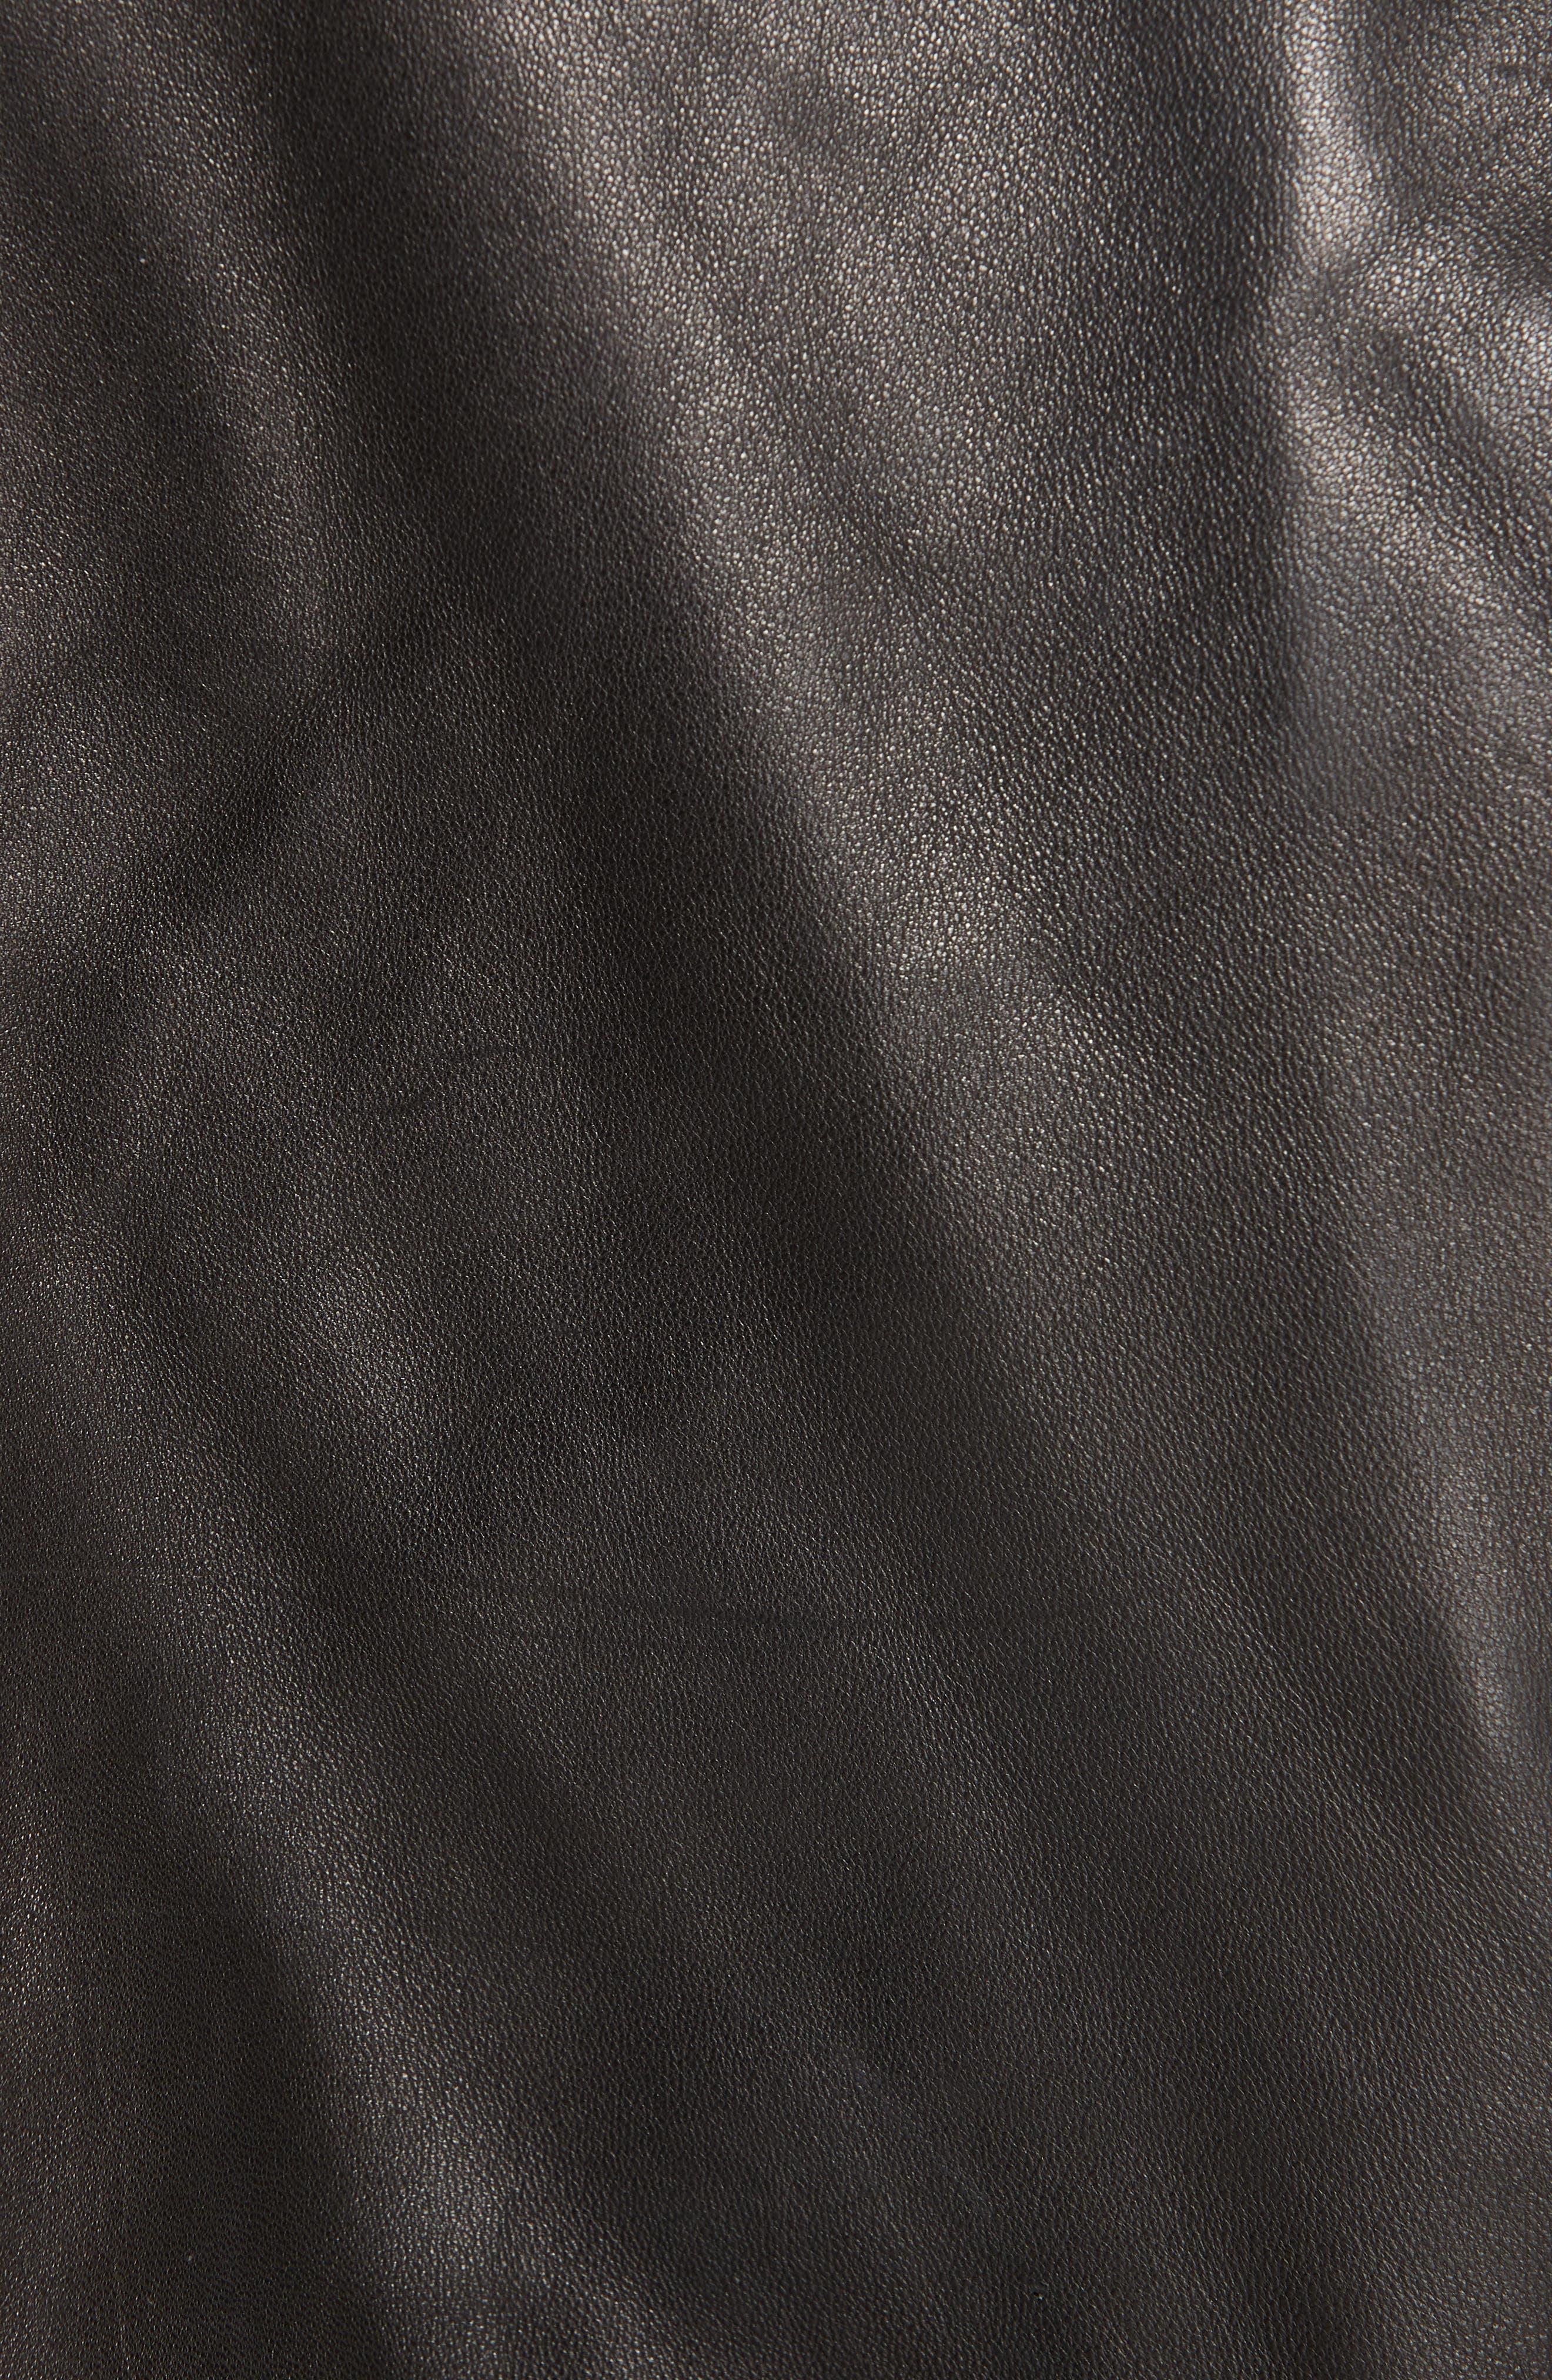 Lambskin Leather Jacket,                             Alternate thumbnail 7, color,                             BLACK